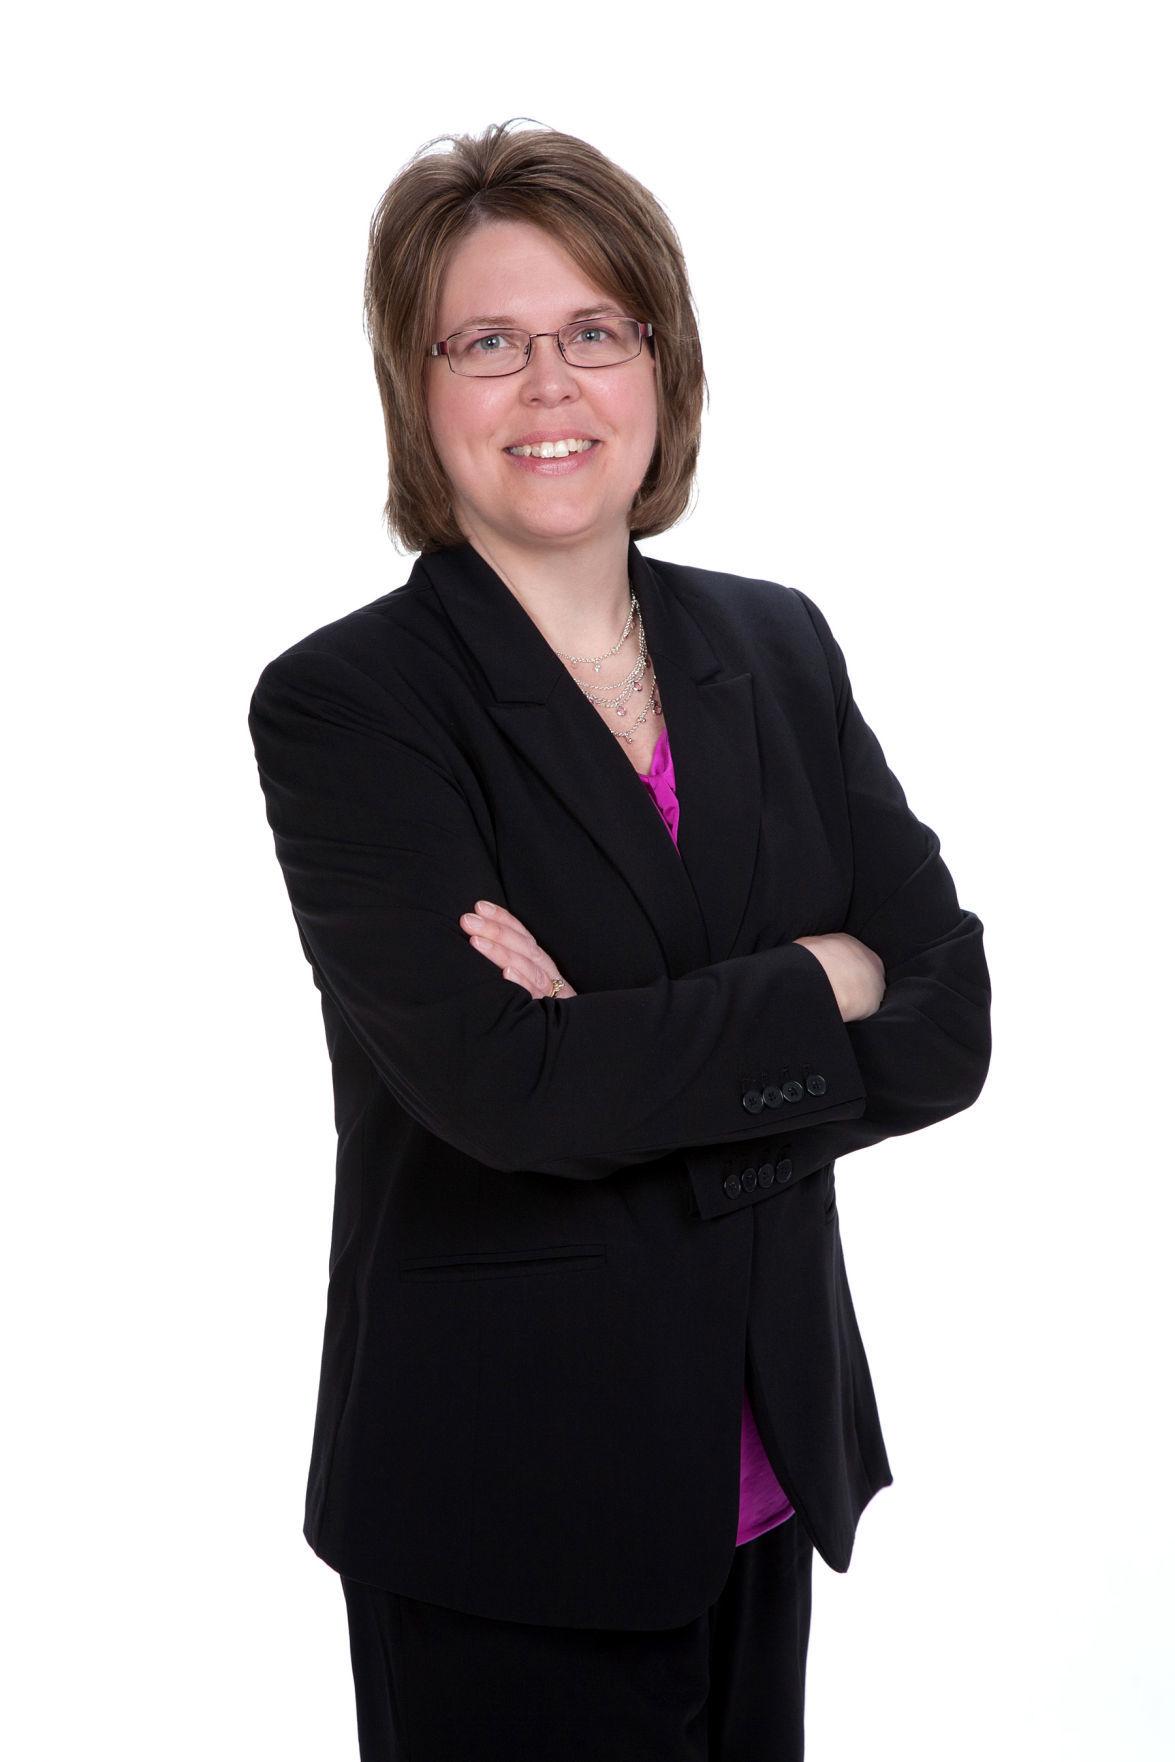 Pam Grazier